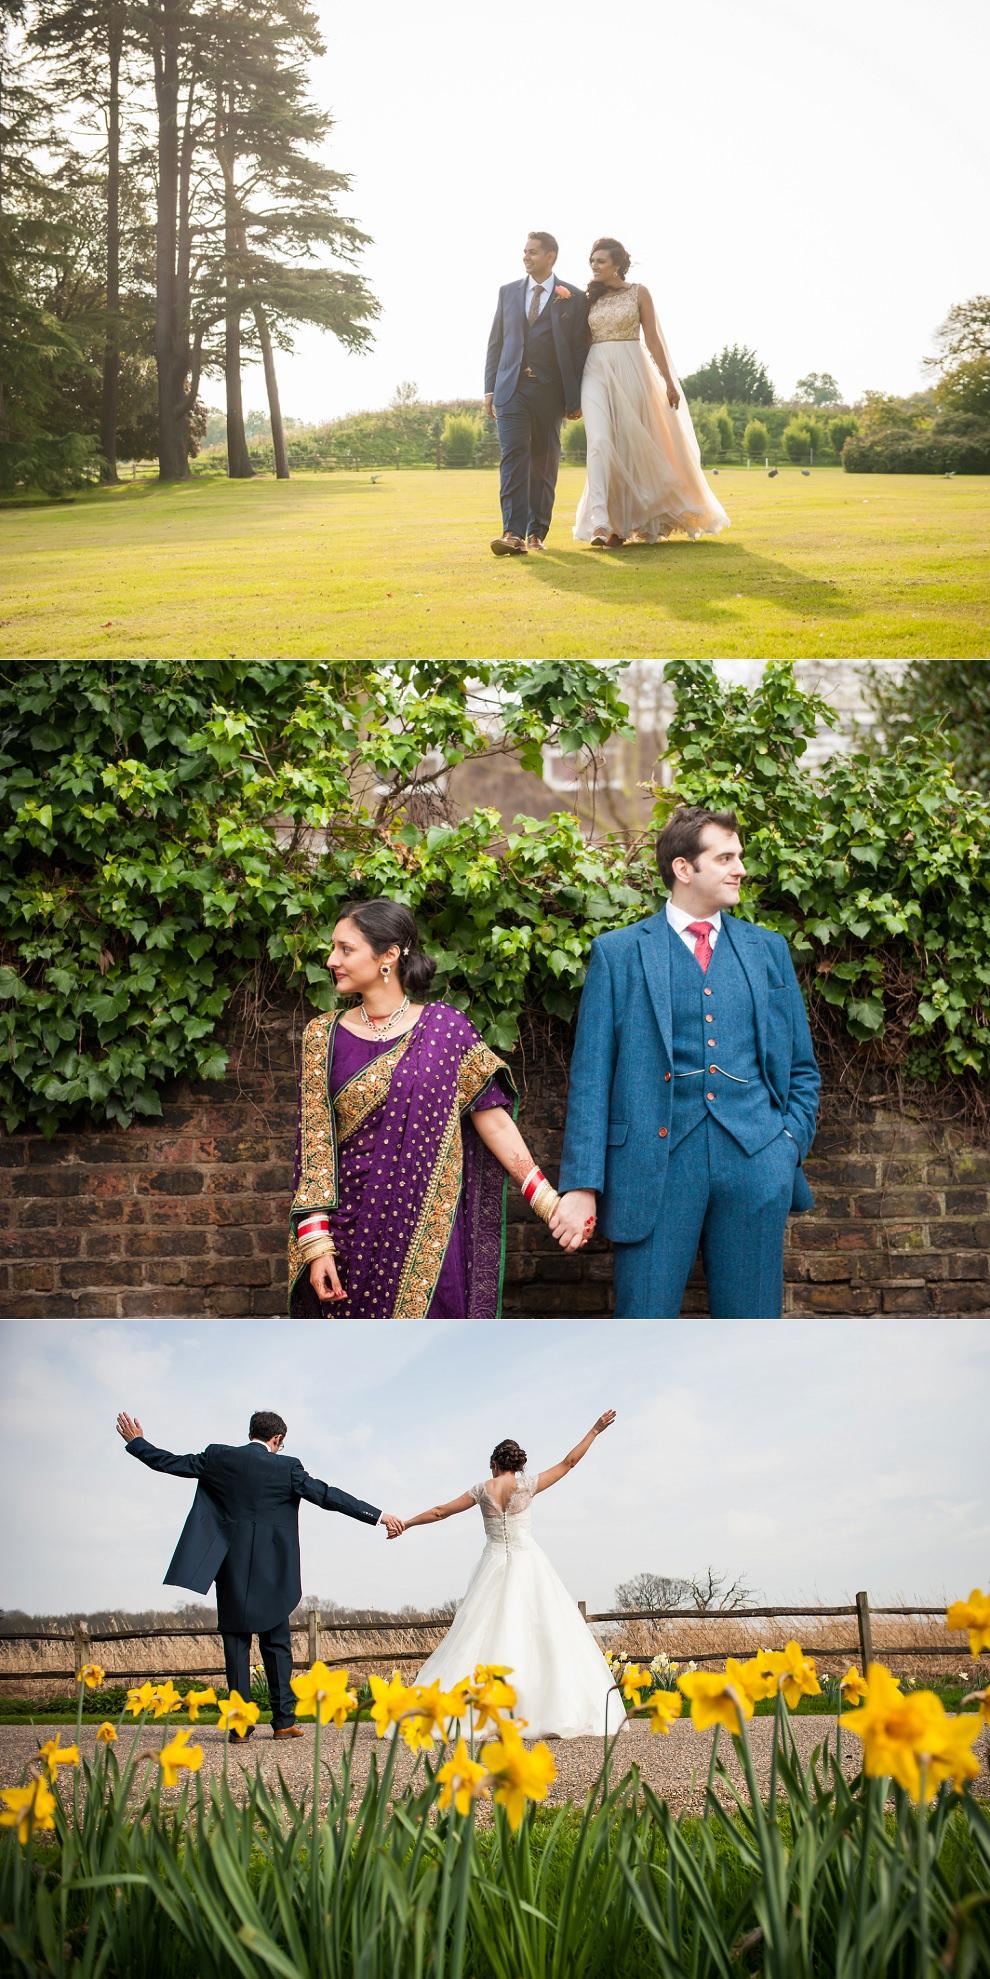 Best-wedding-photos-UK-2015-099